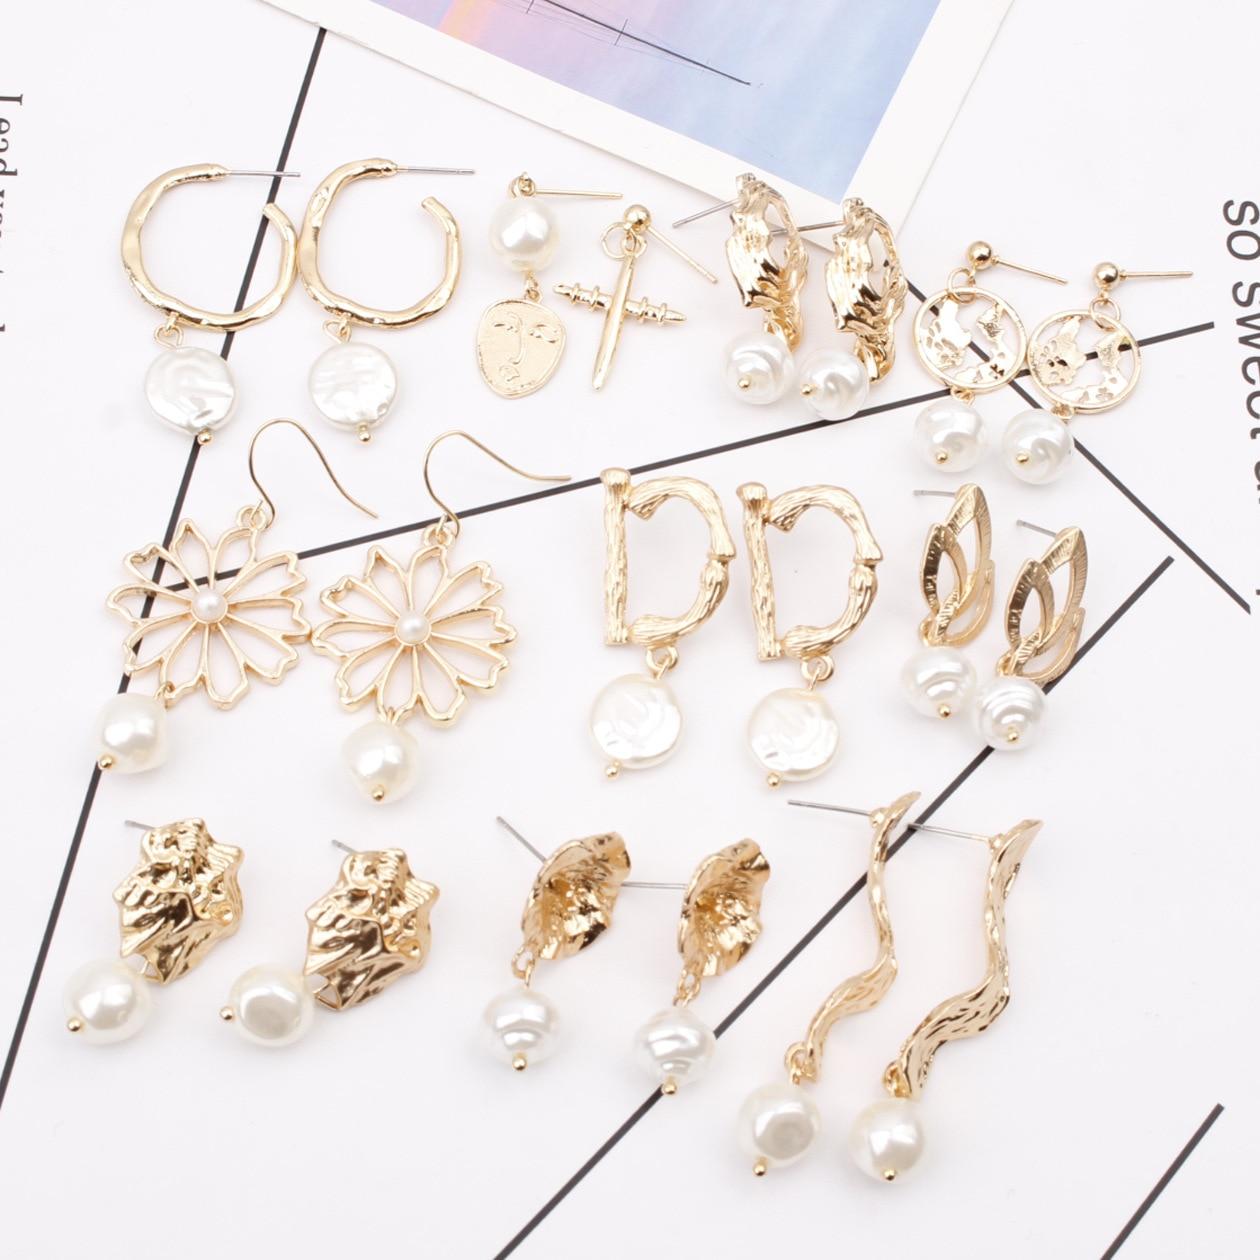 Ruifan Gold Color Korean Baroque Pearl Stud Earrings for Women Irregular Earing Women Accessories Fashion Jewelry 2019 YEA289